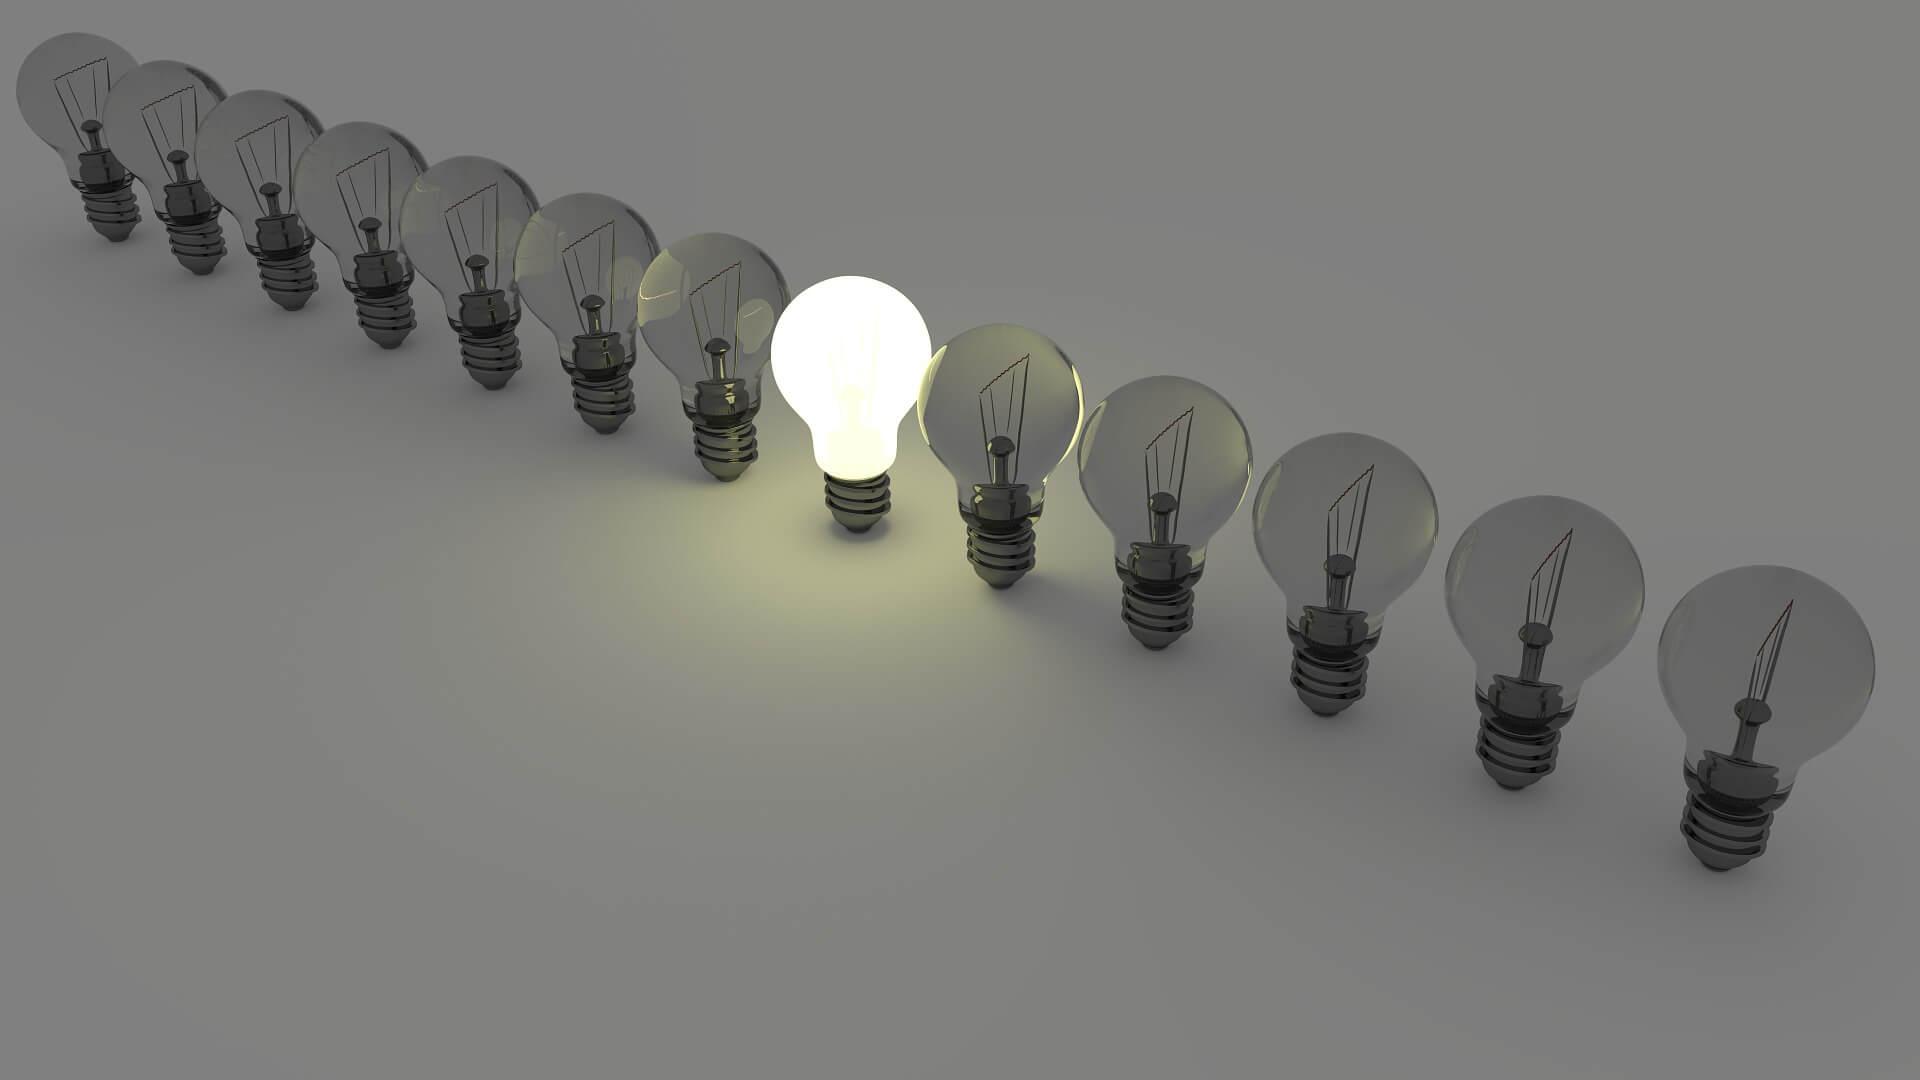 a single light bulb turned on